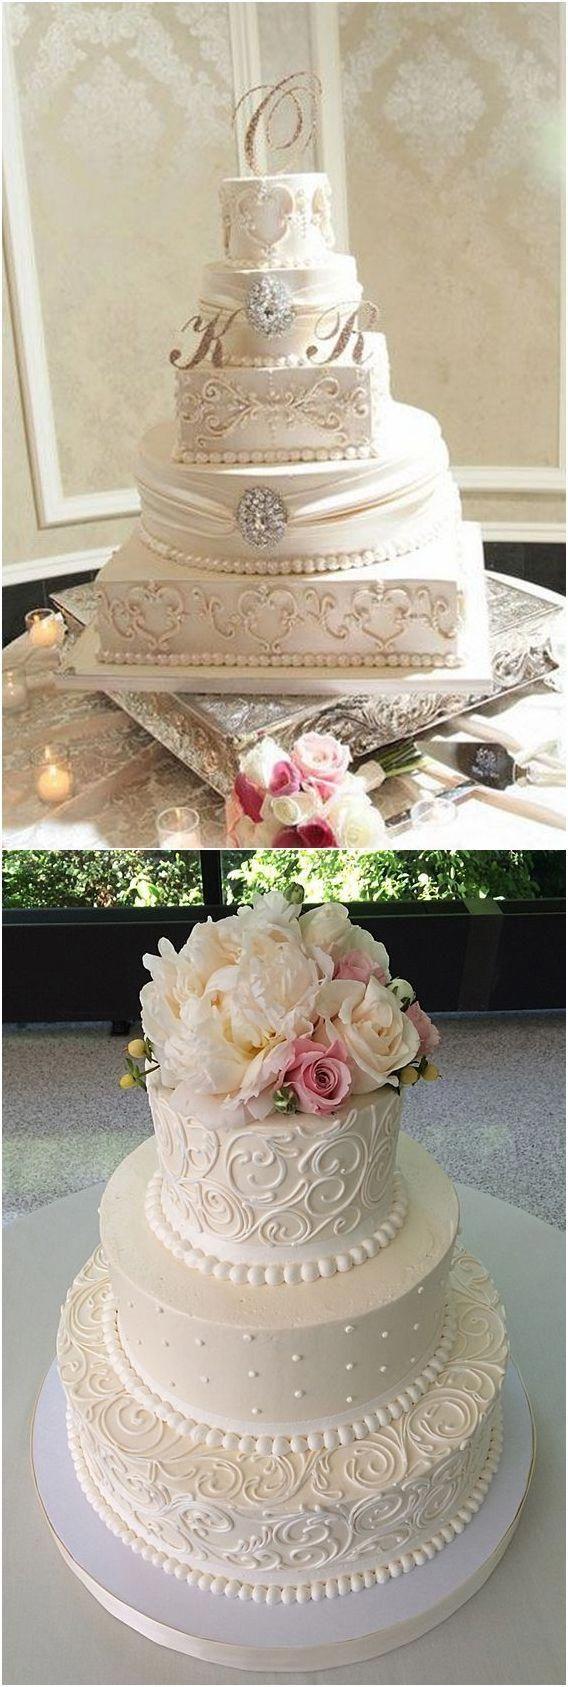 romantic weddings ideas which is fabulous